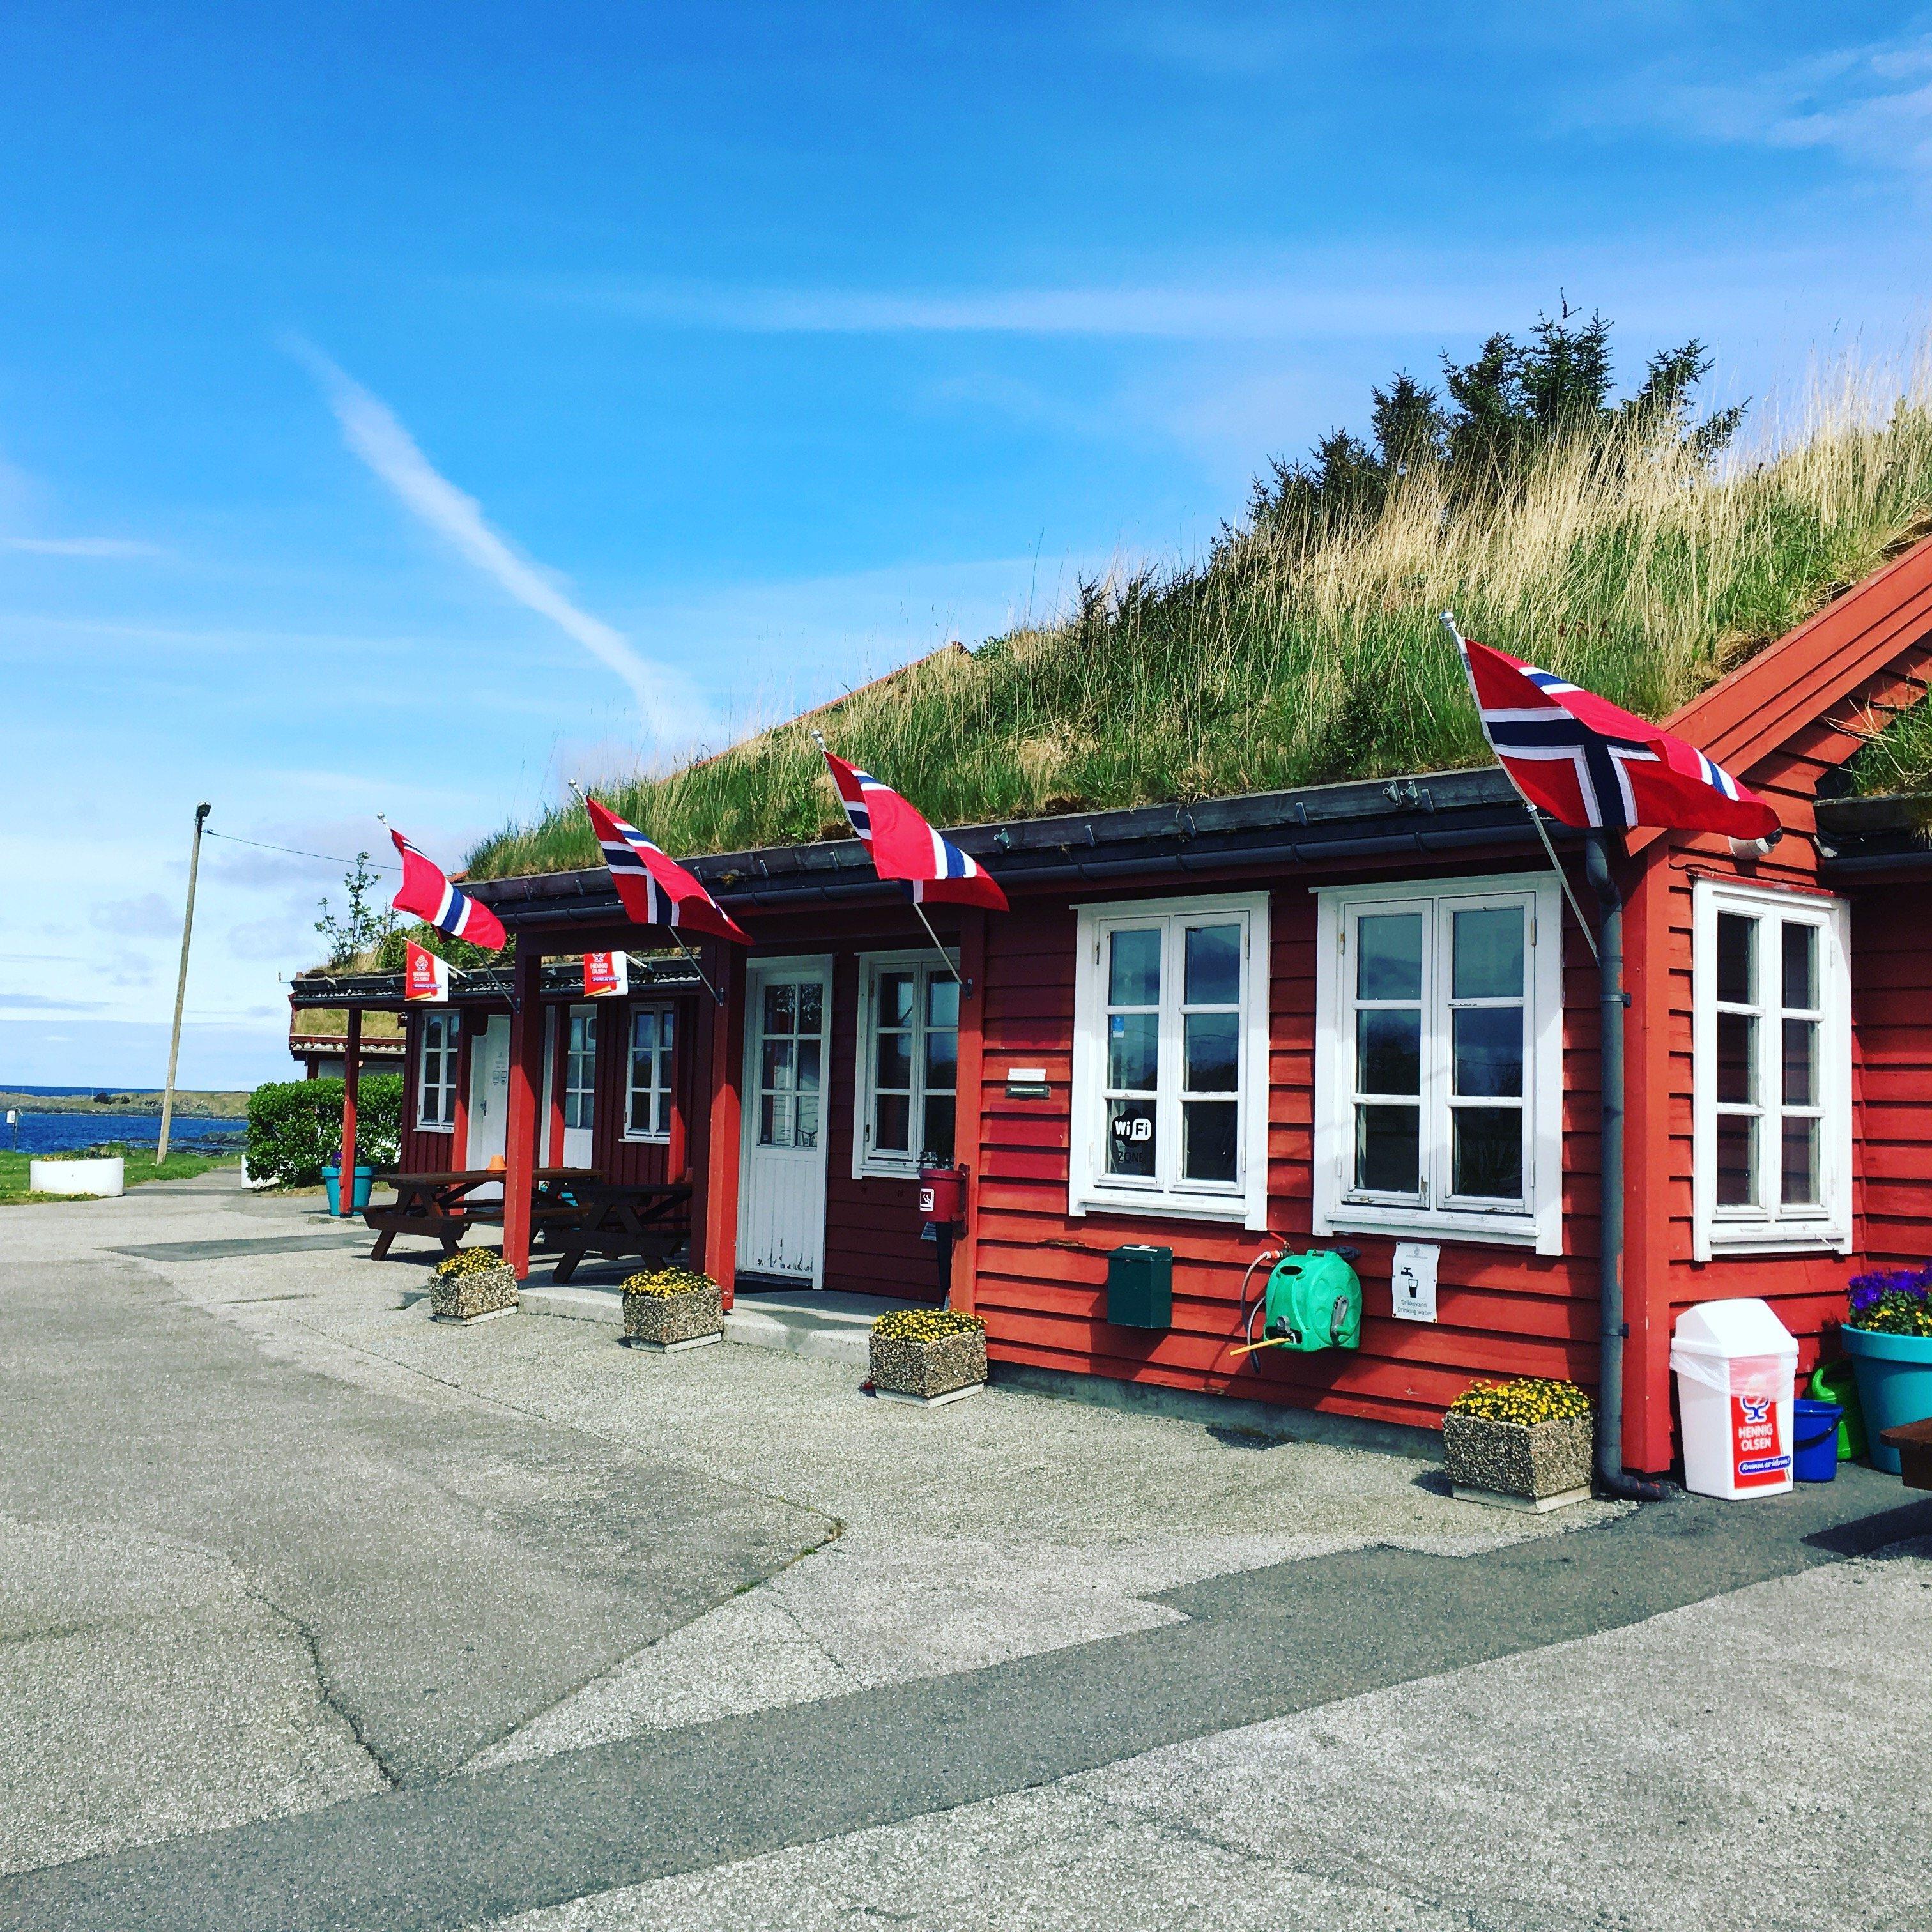 beste dating app norge Haugesund